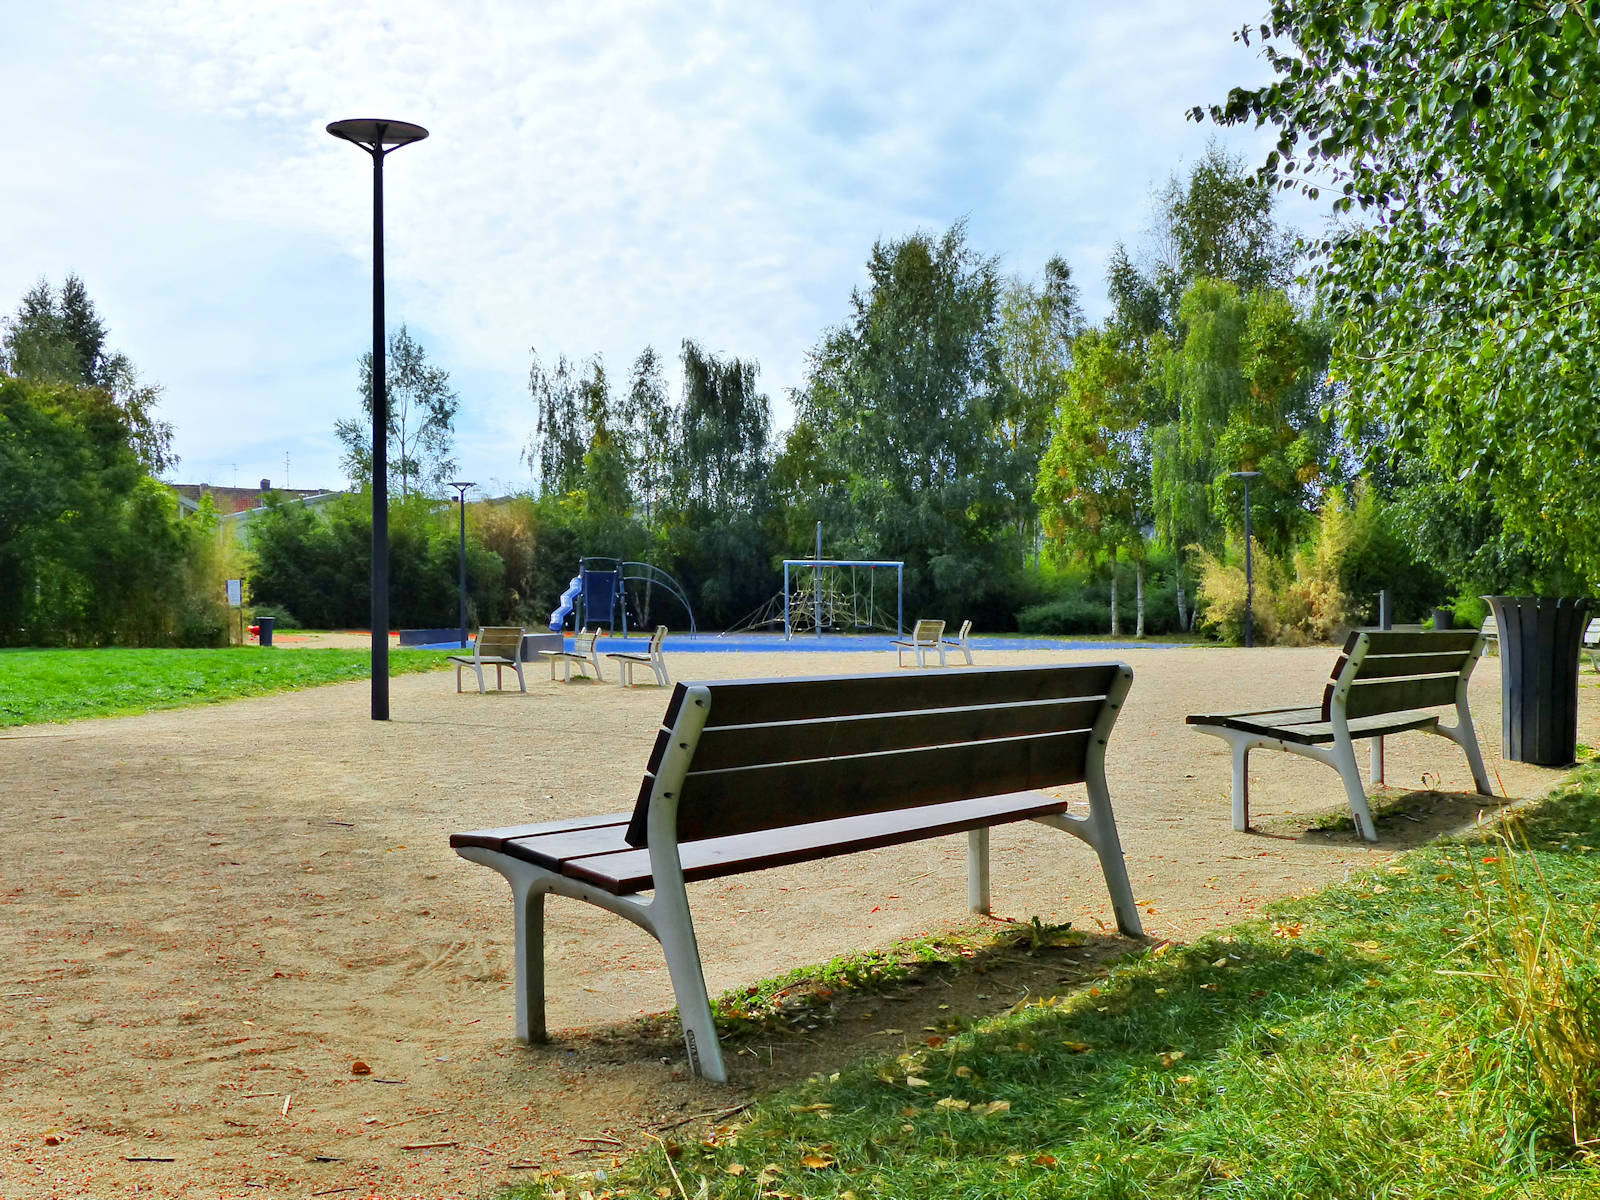 Parc Jean Moulin, Tourcoing - banc